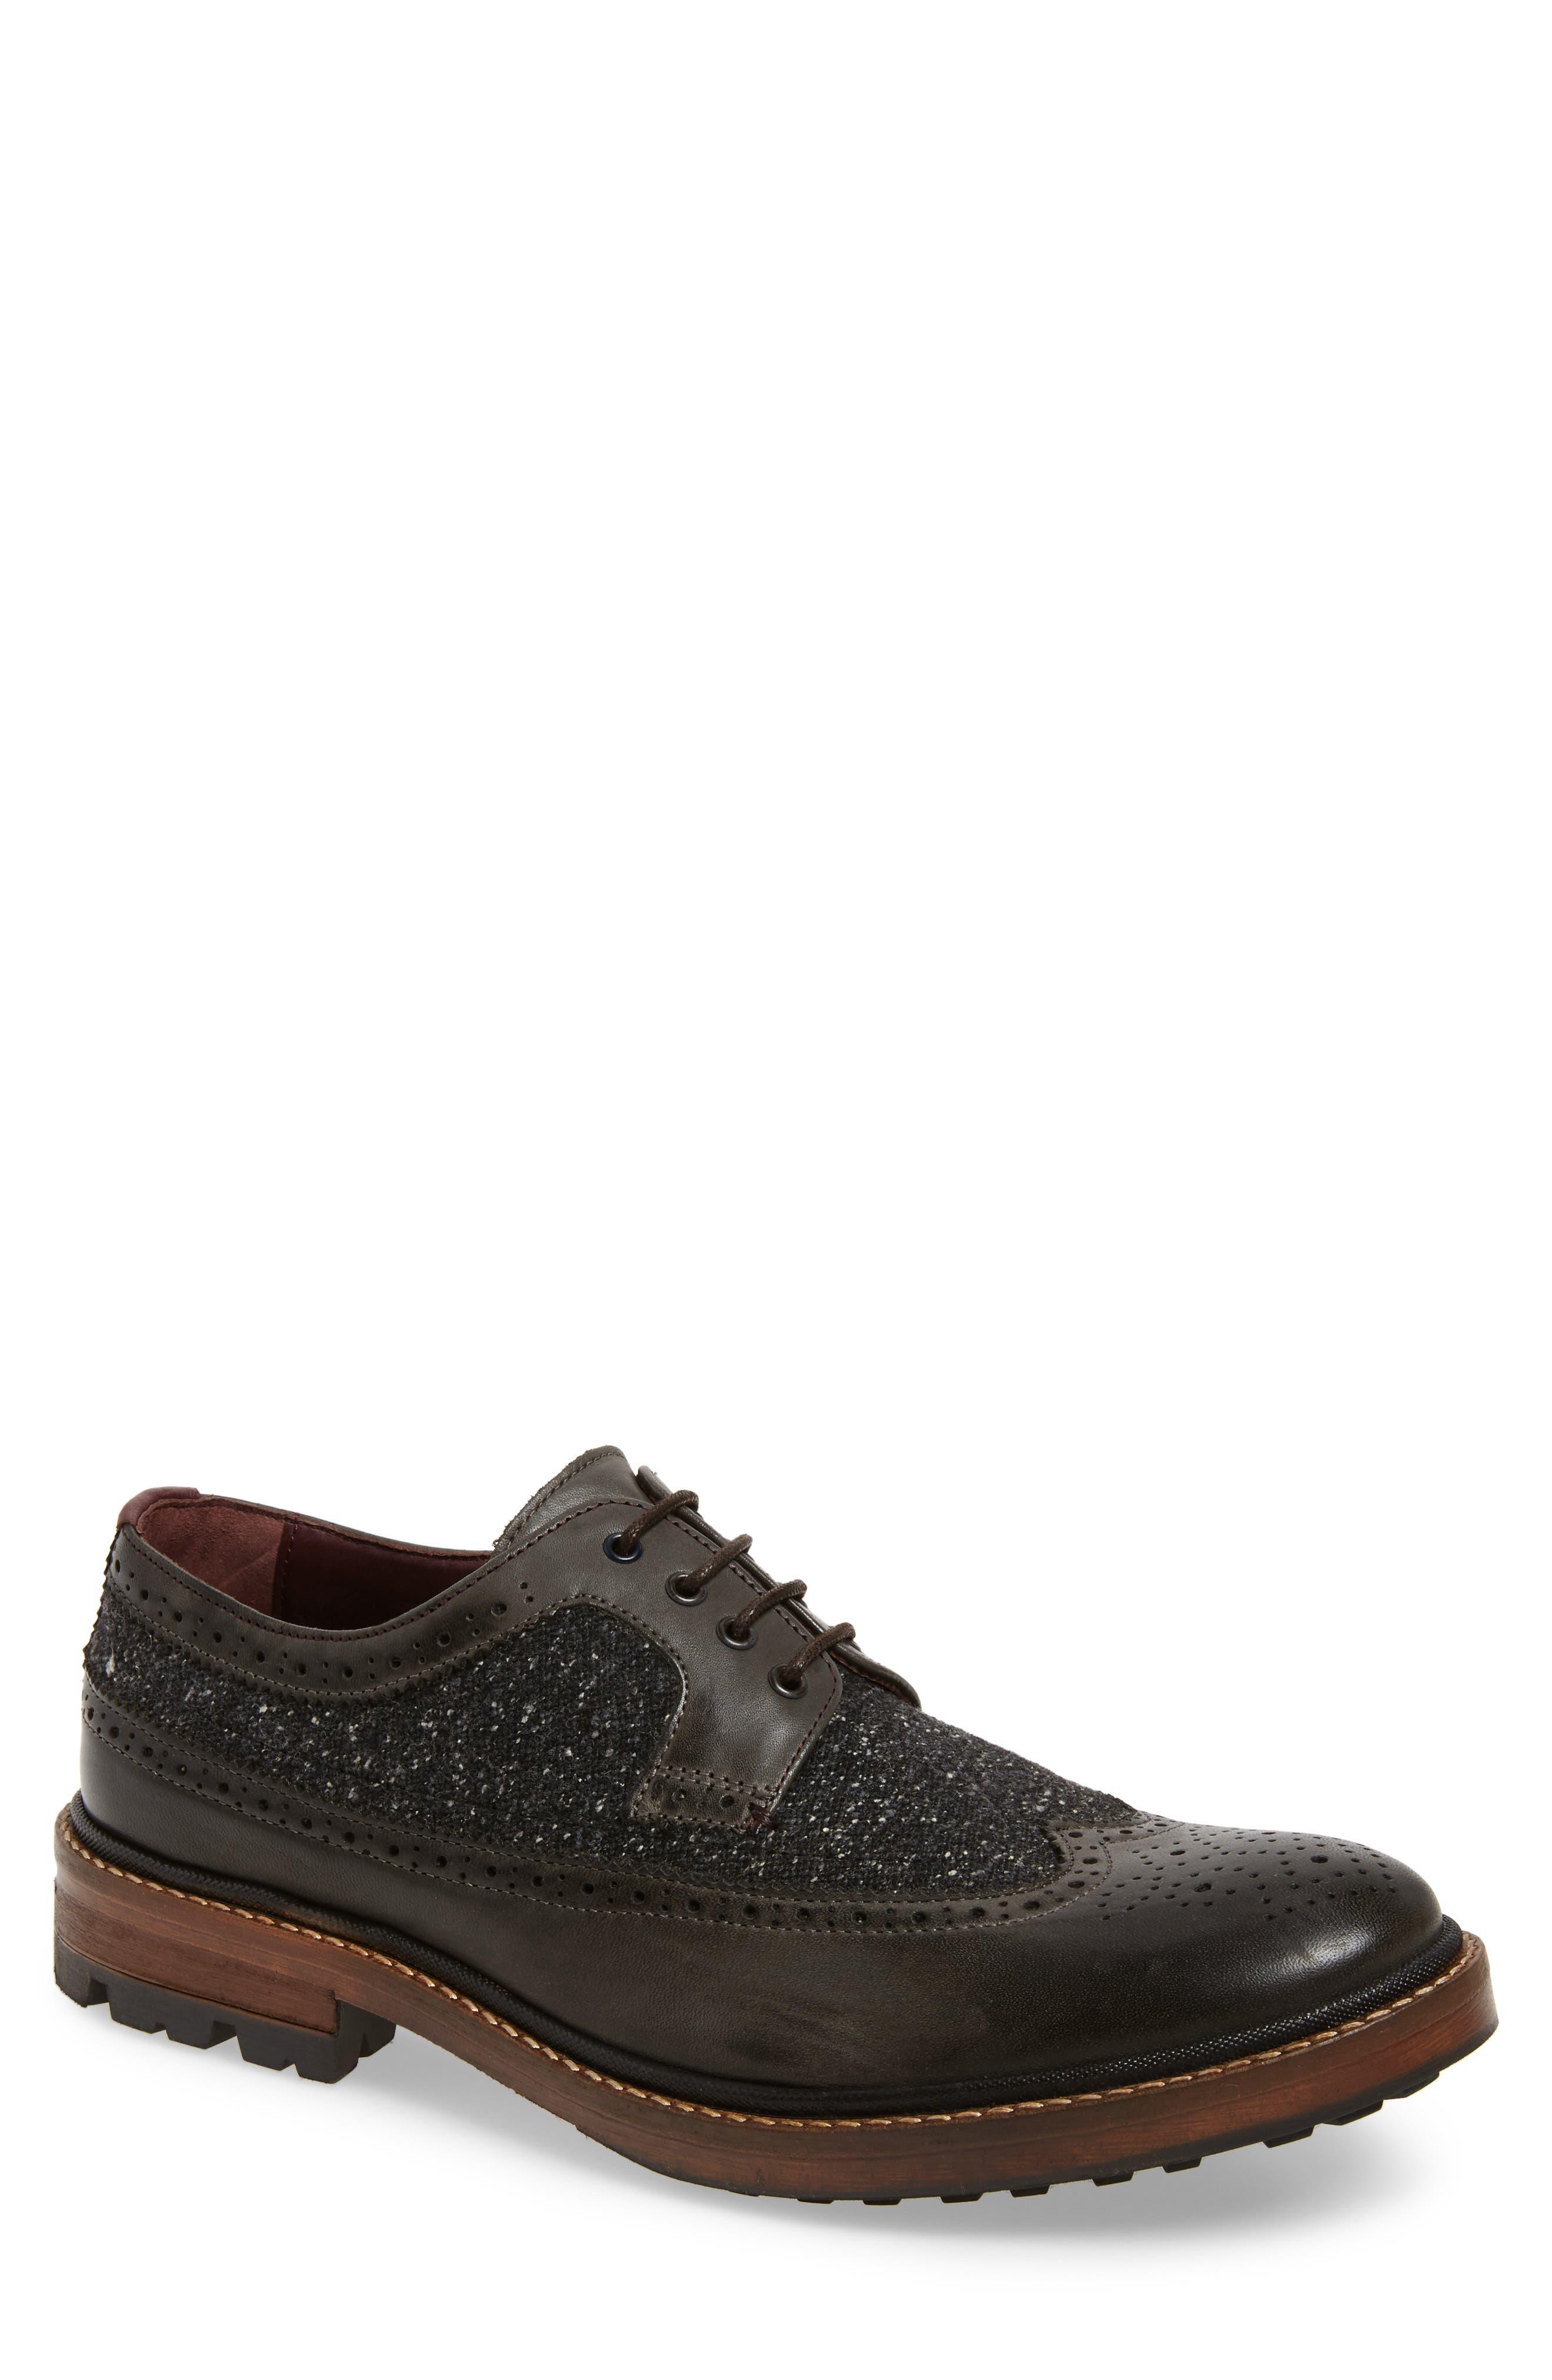 Casbo Spectator Shoe,                         Main,                         color,